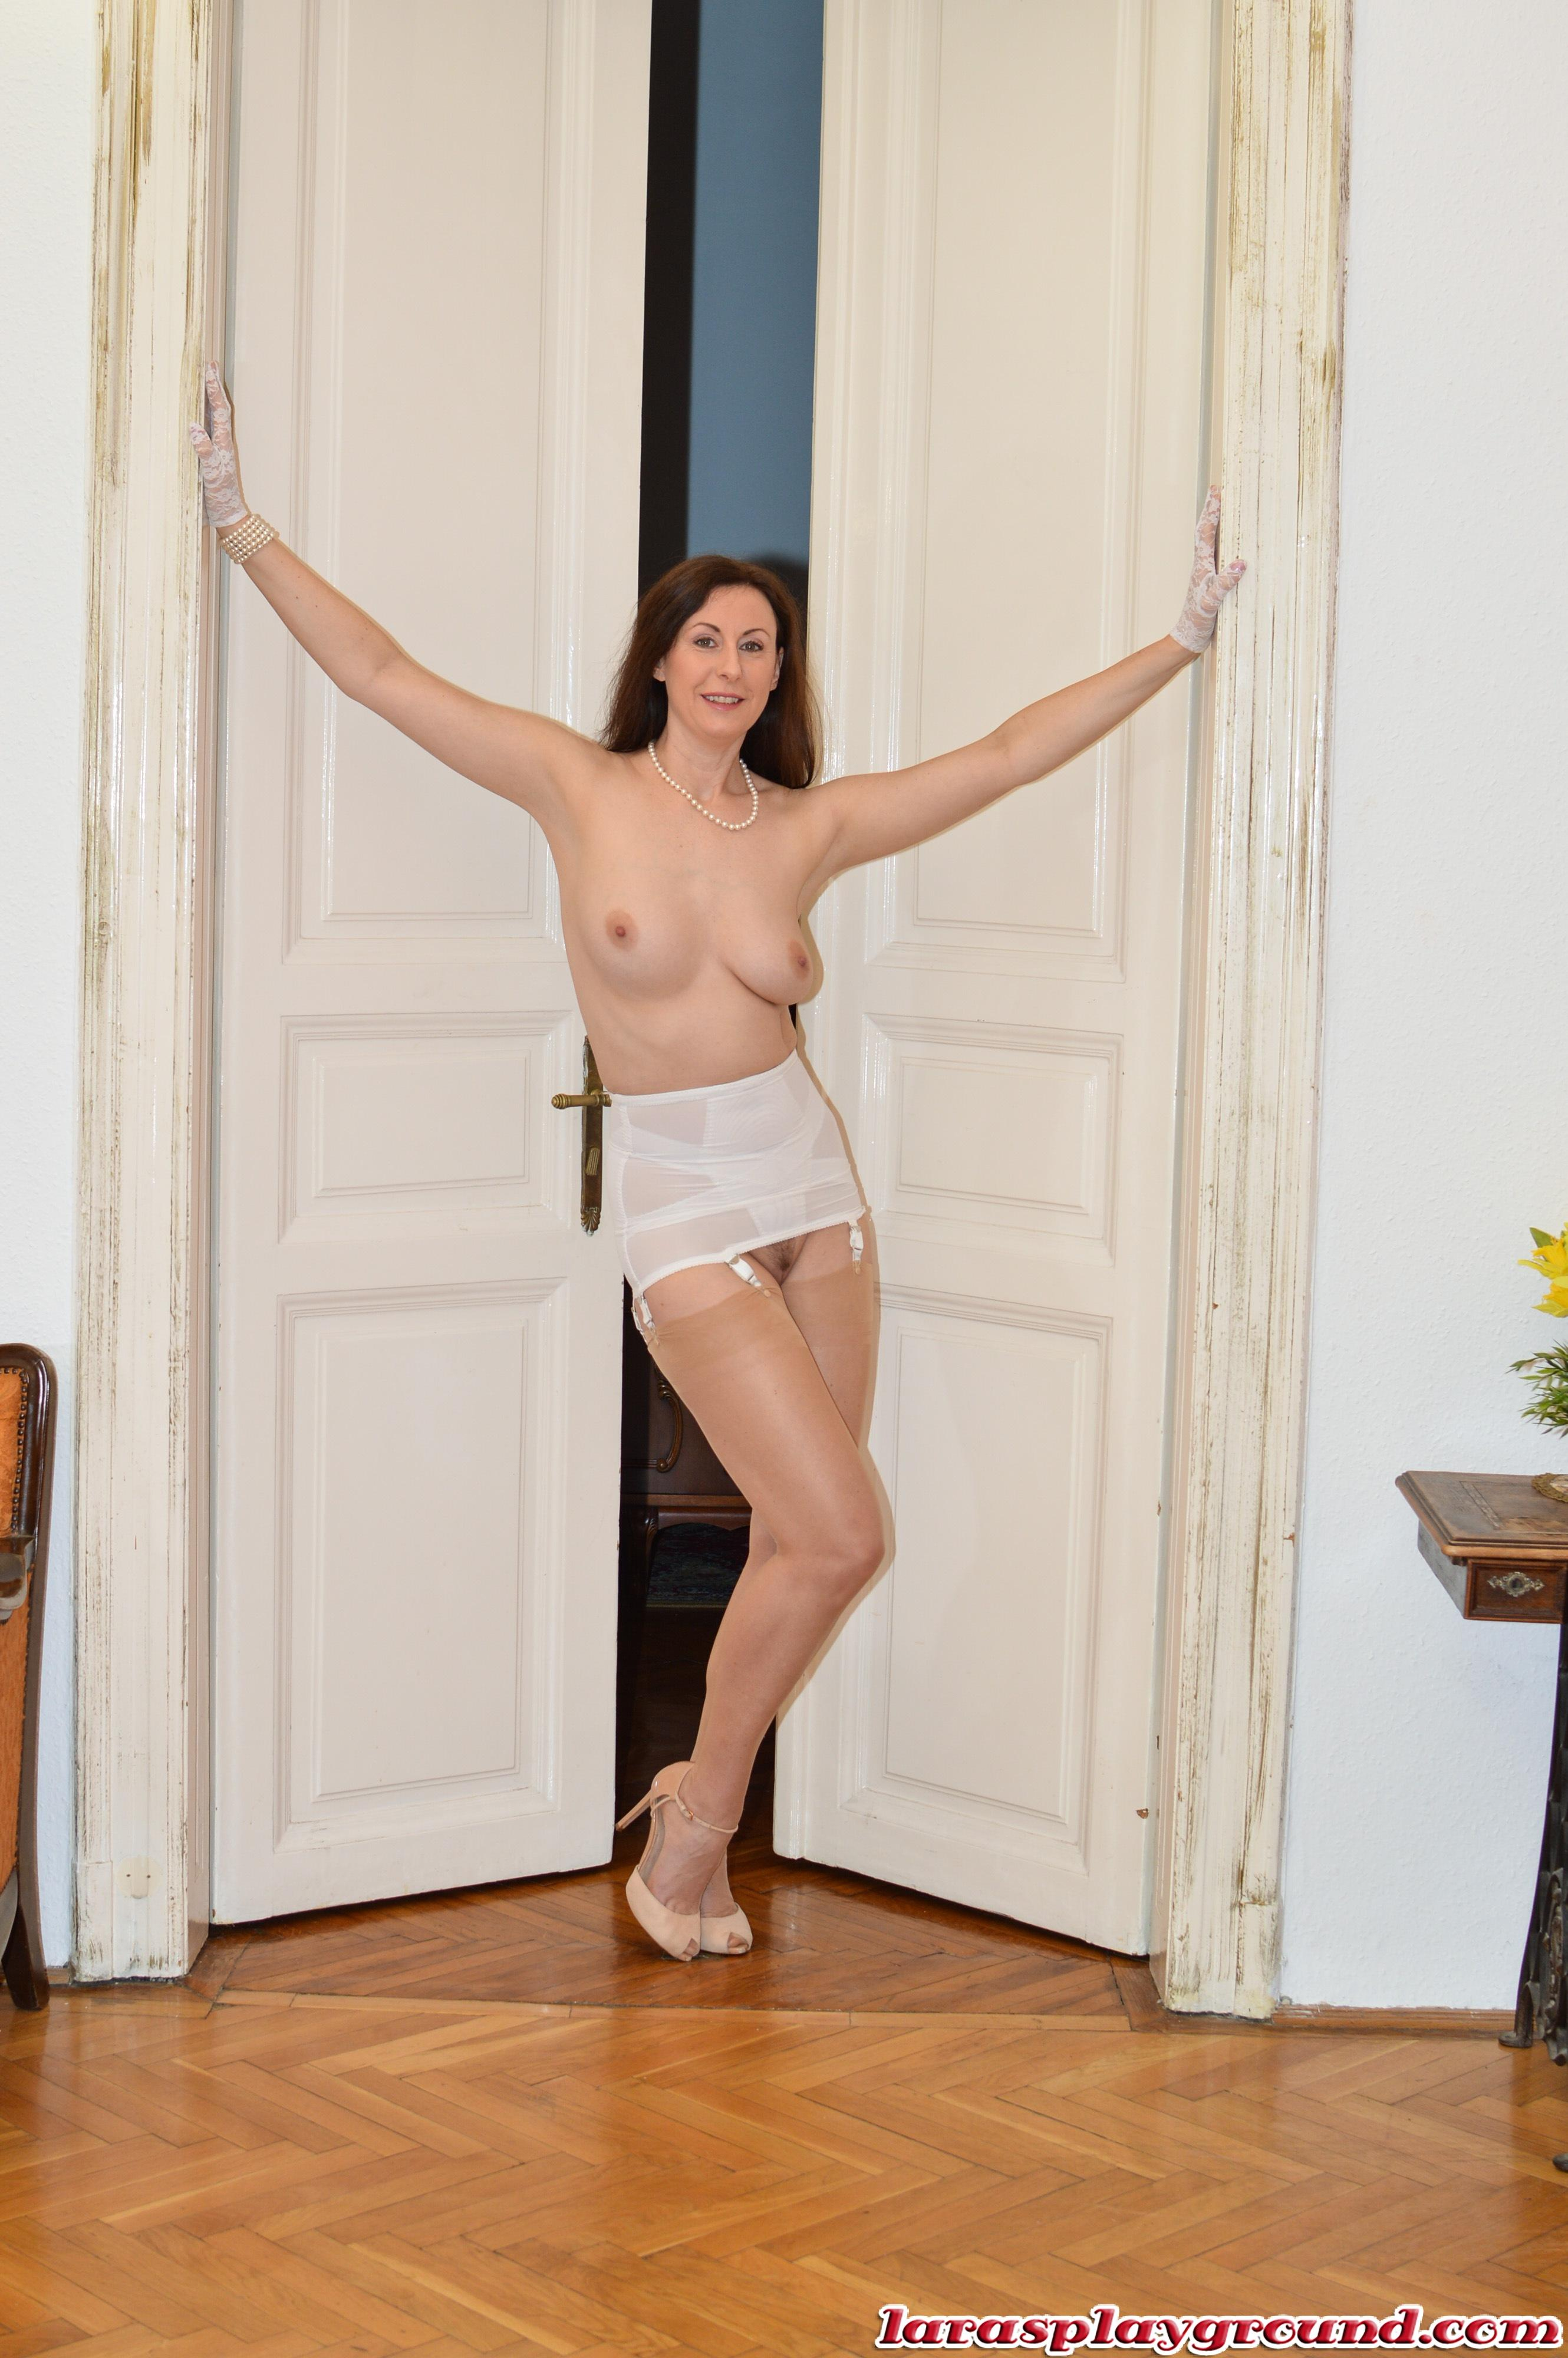 Big boobs latina